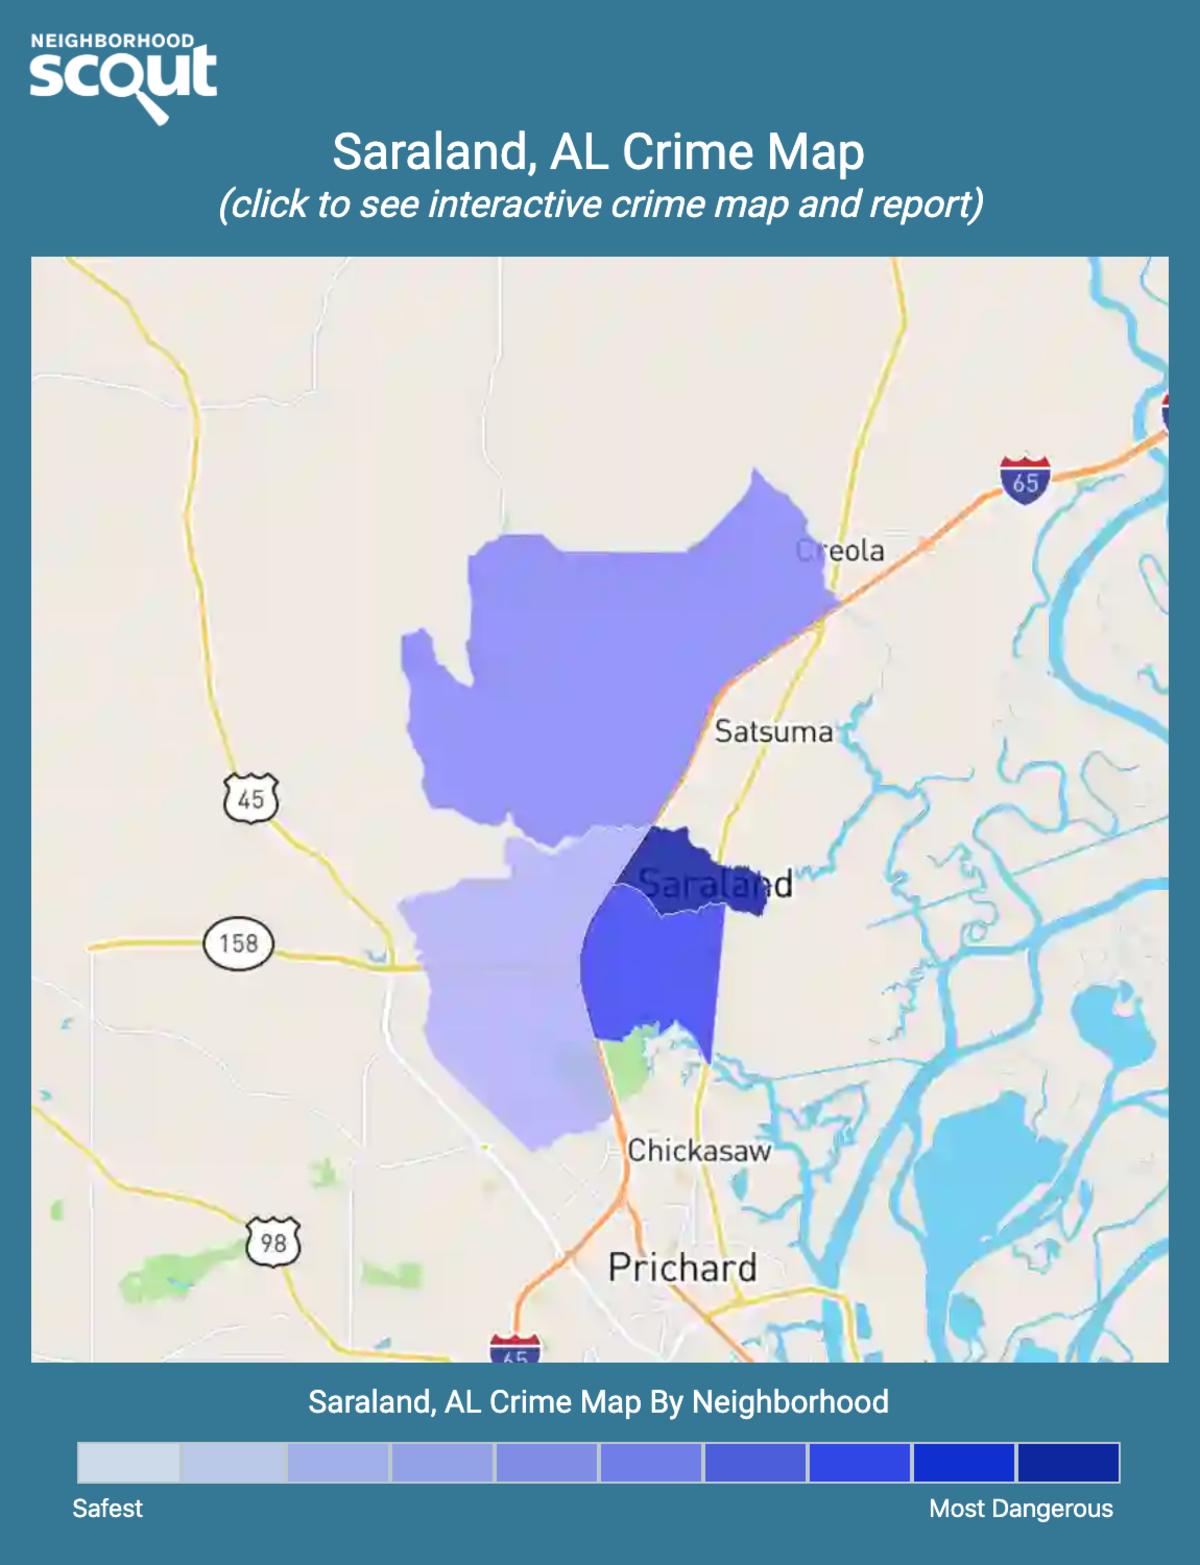 Saraland Alabama: Saraland, 36613 Crime Rates And Crime Statistics